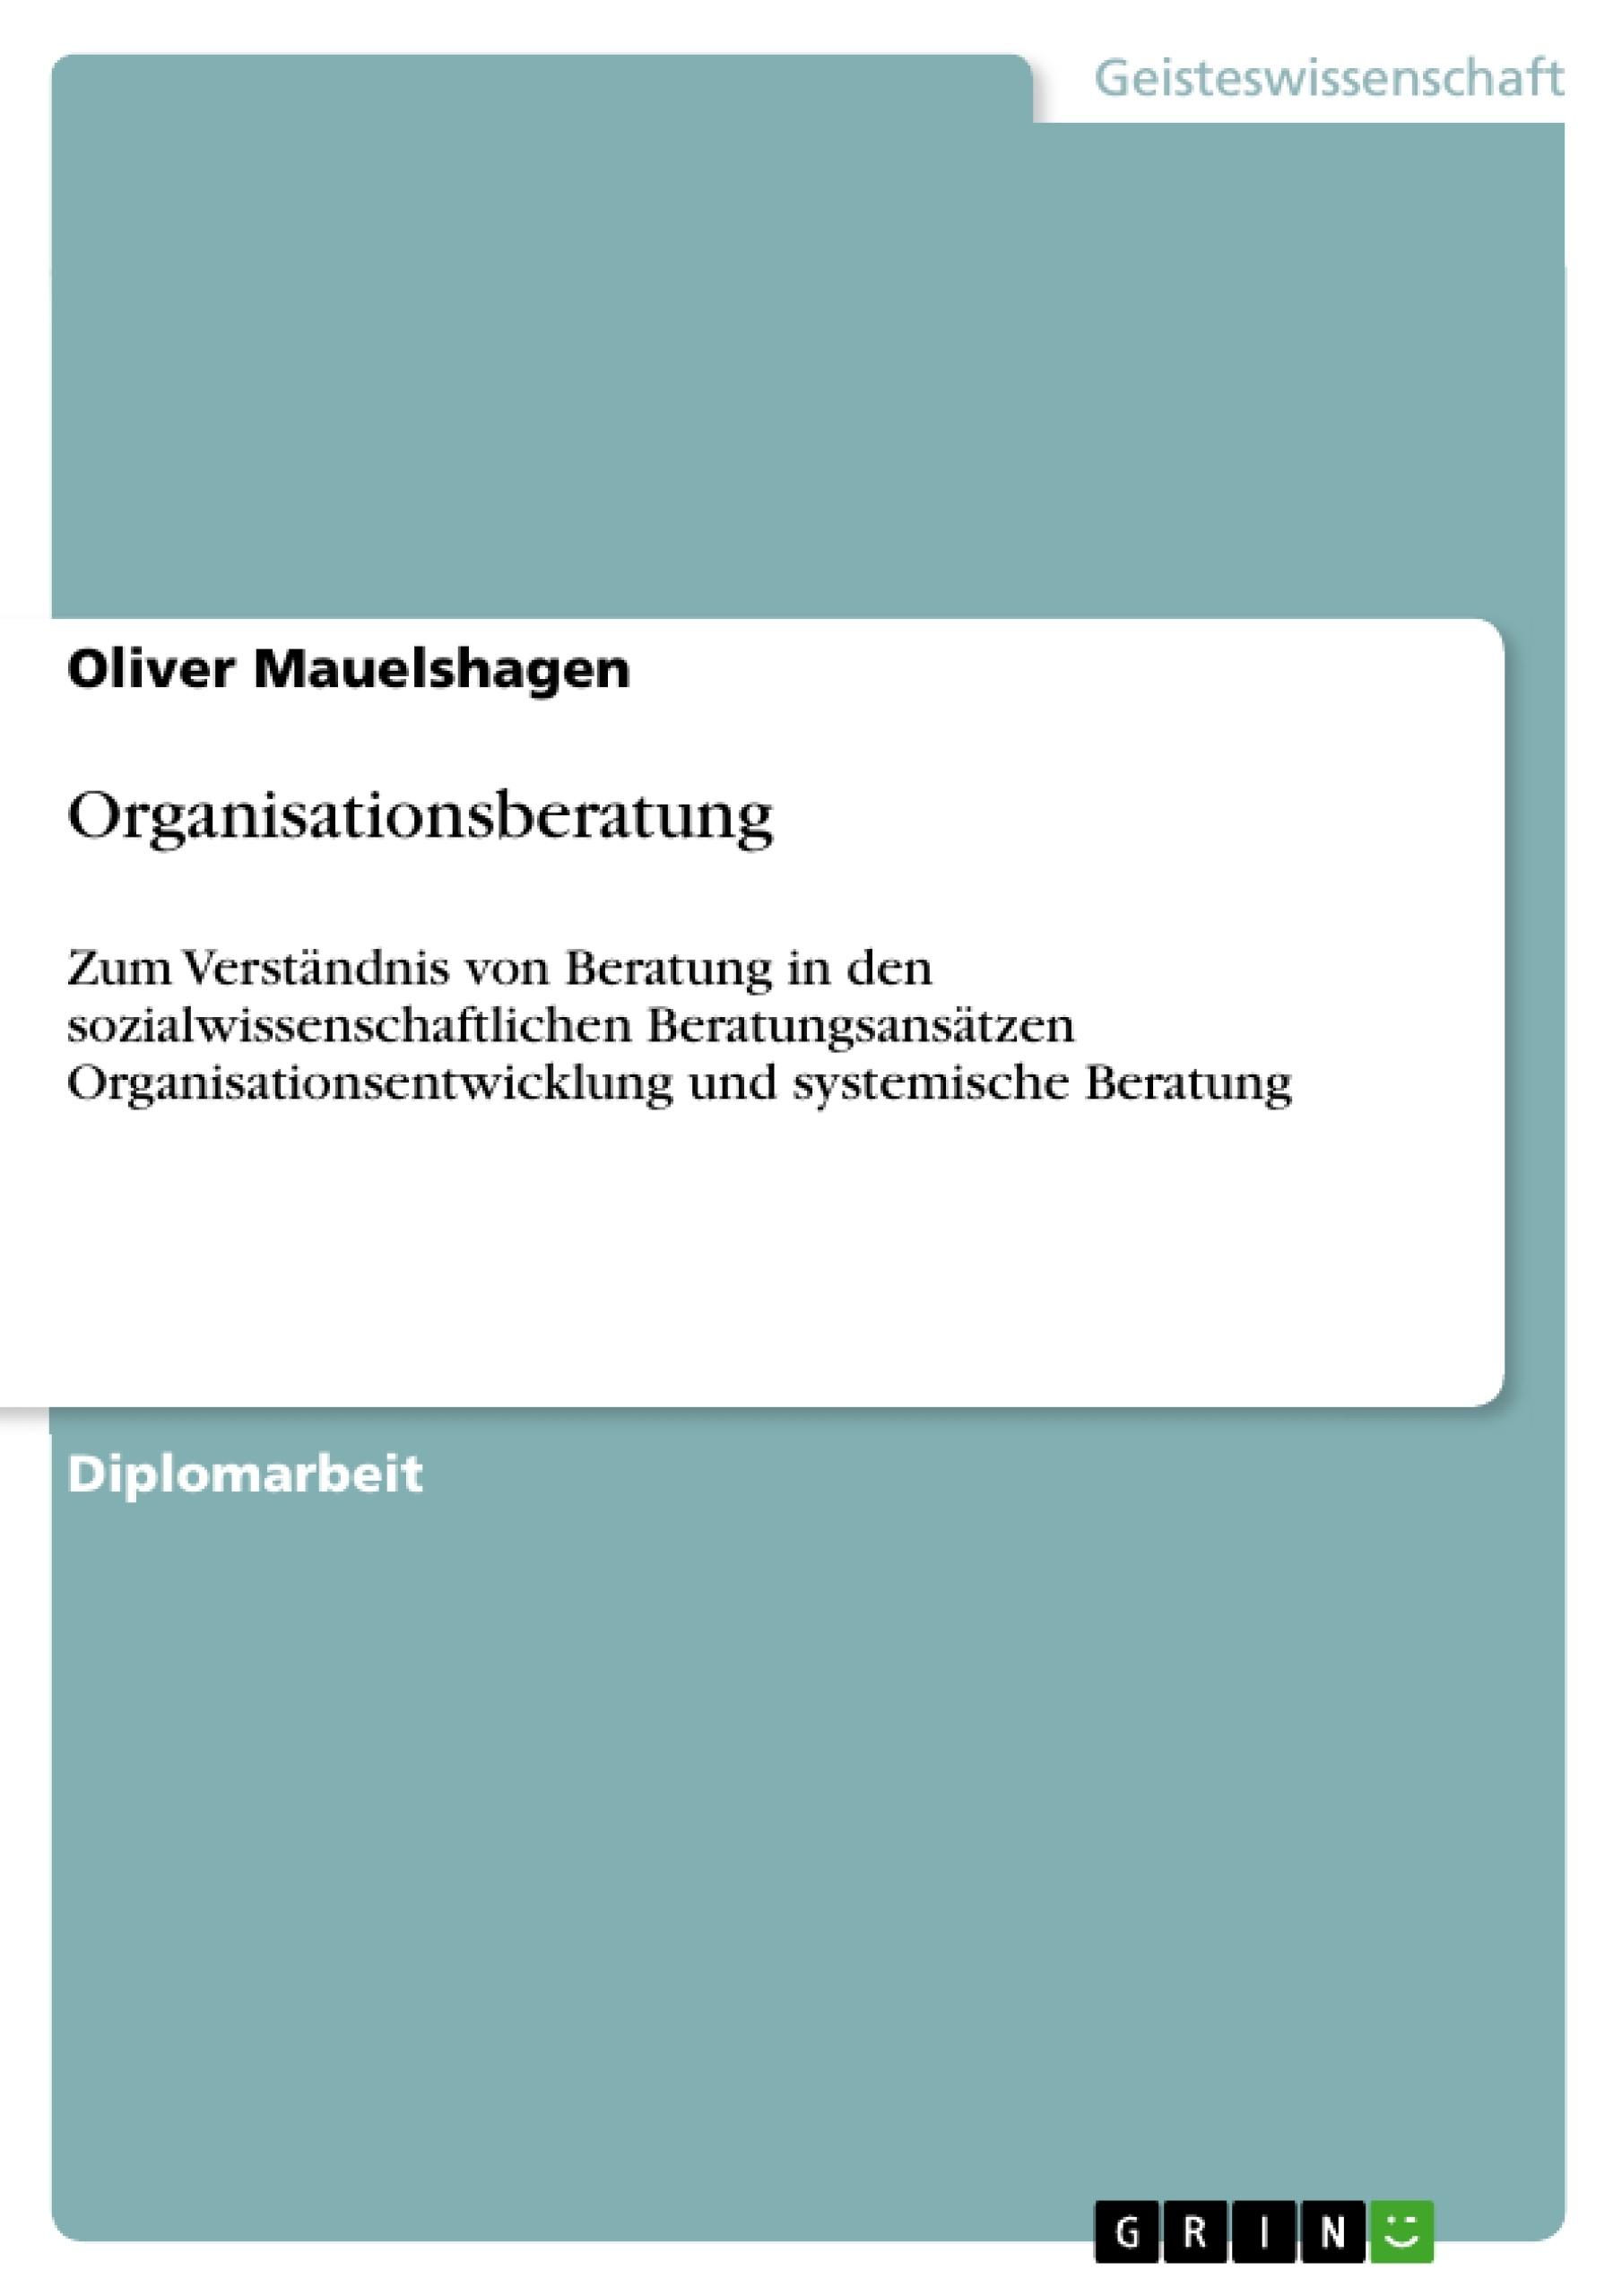 Titel: Organisationsberatung